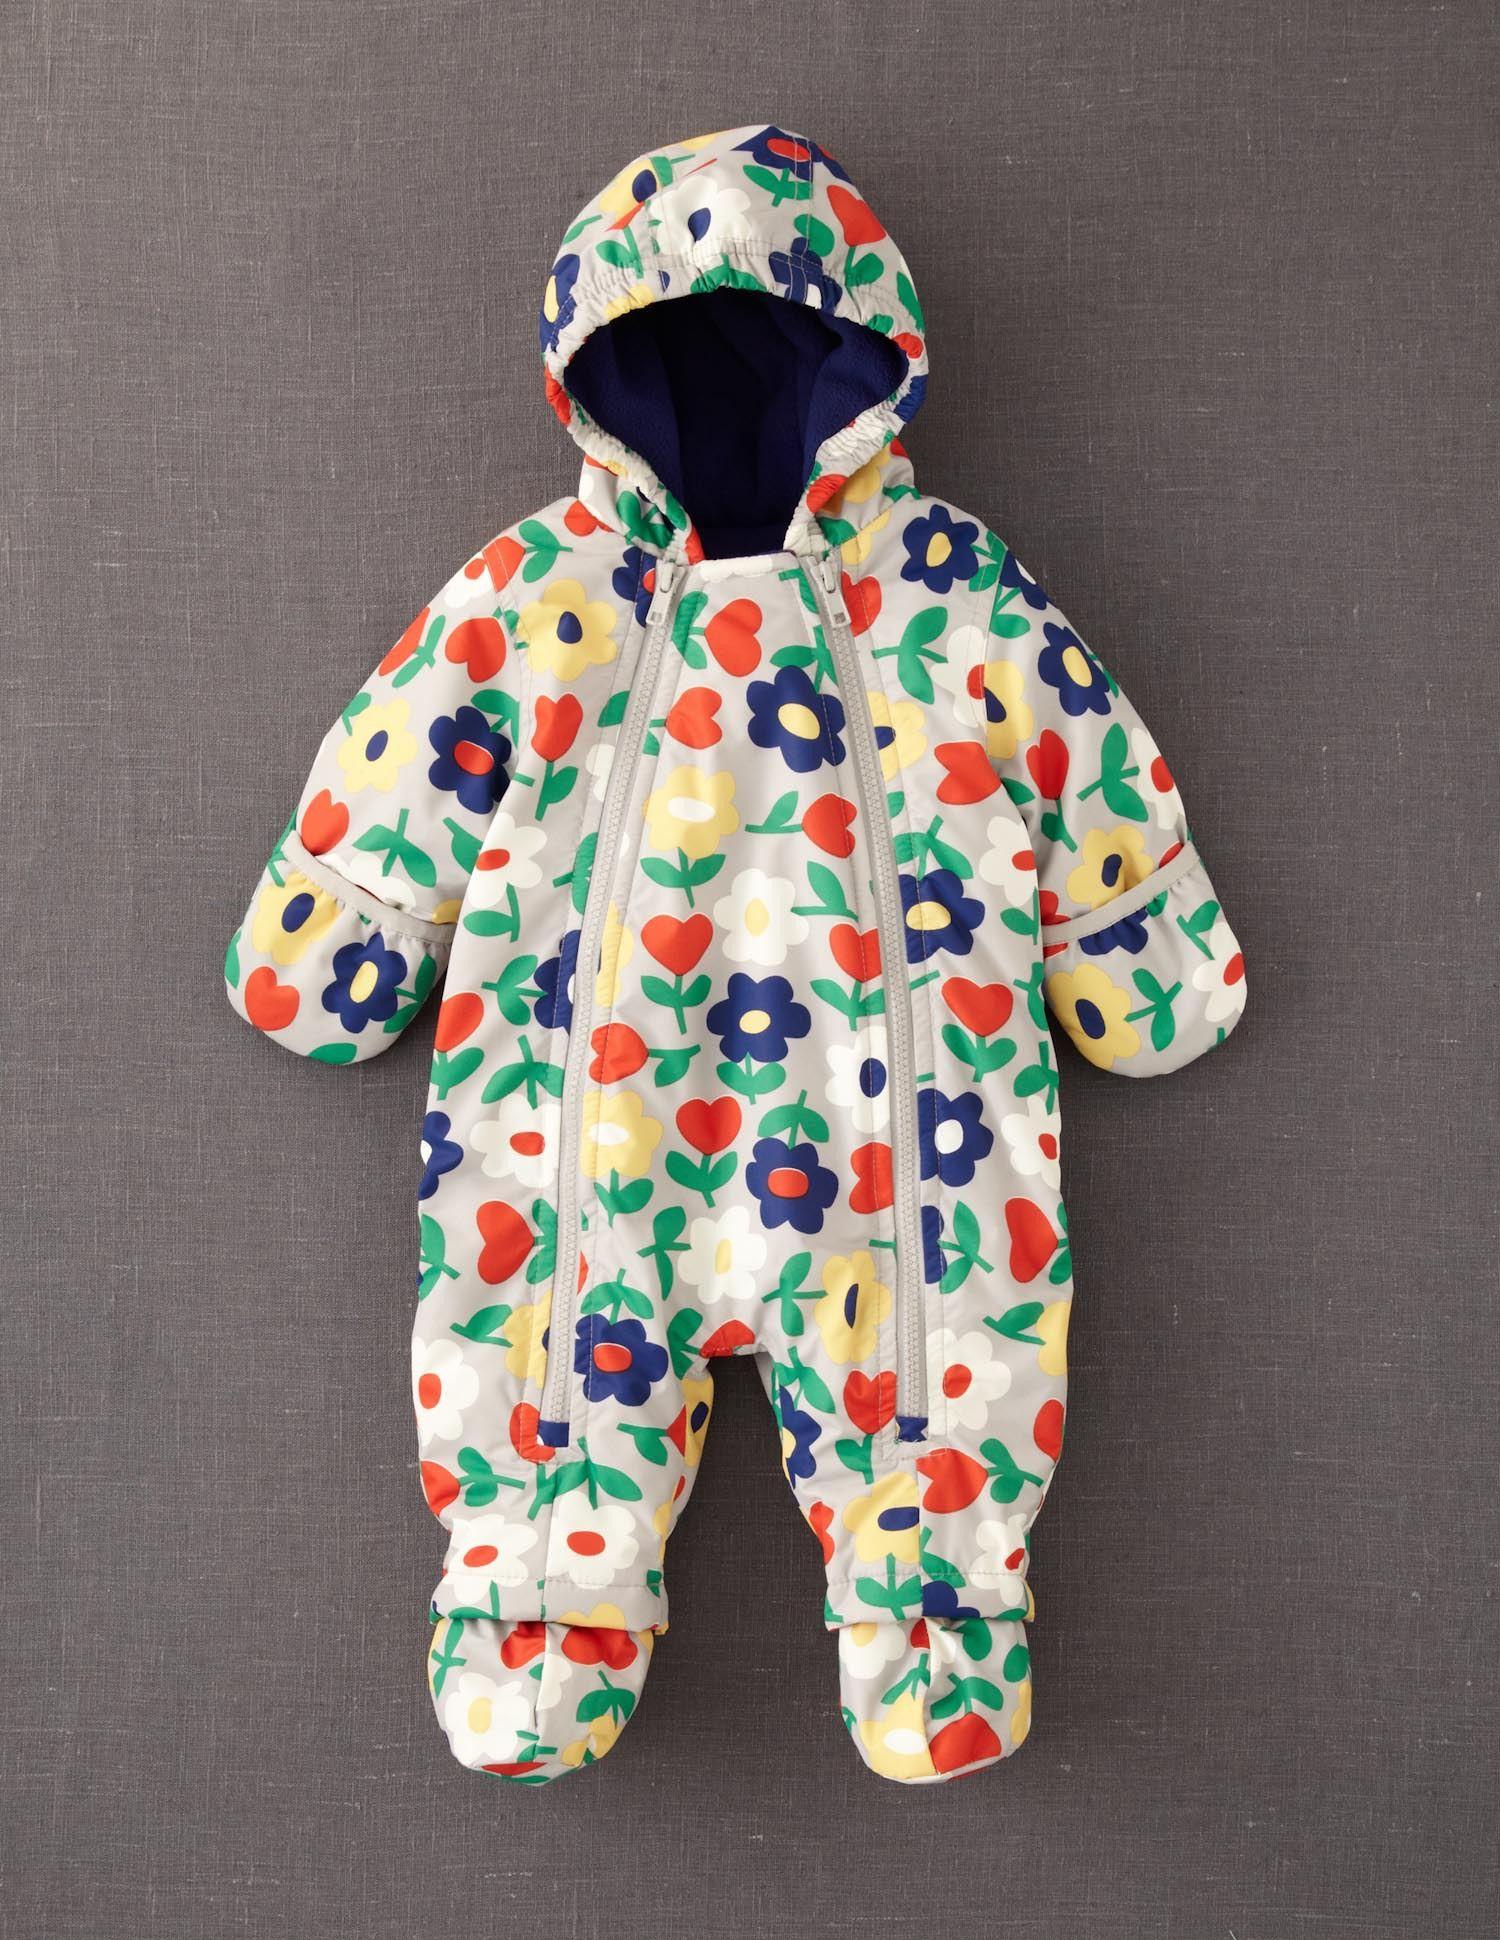 9bad0404f Mini Boden snowsuit | Little Feet, Big Dreams | Baby, Bekleidung ...